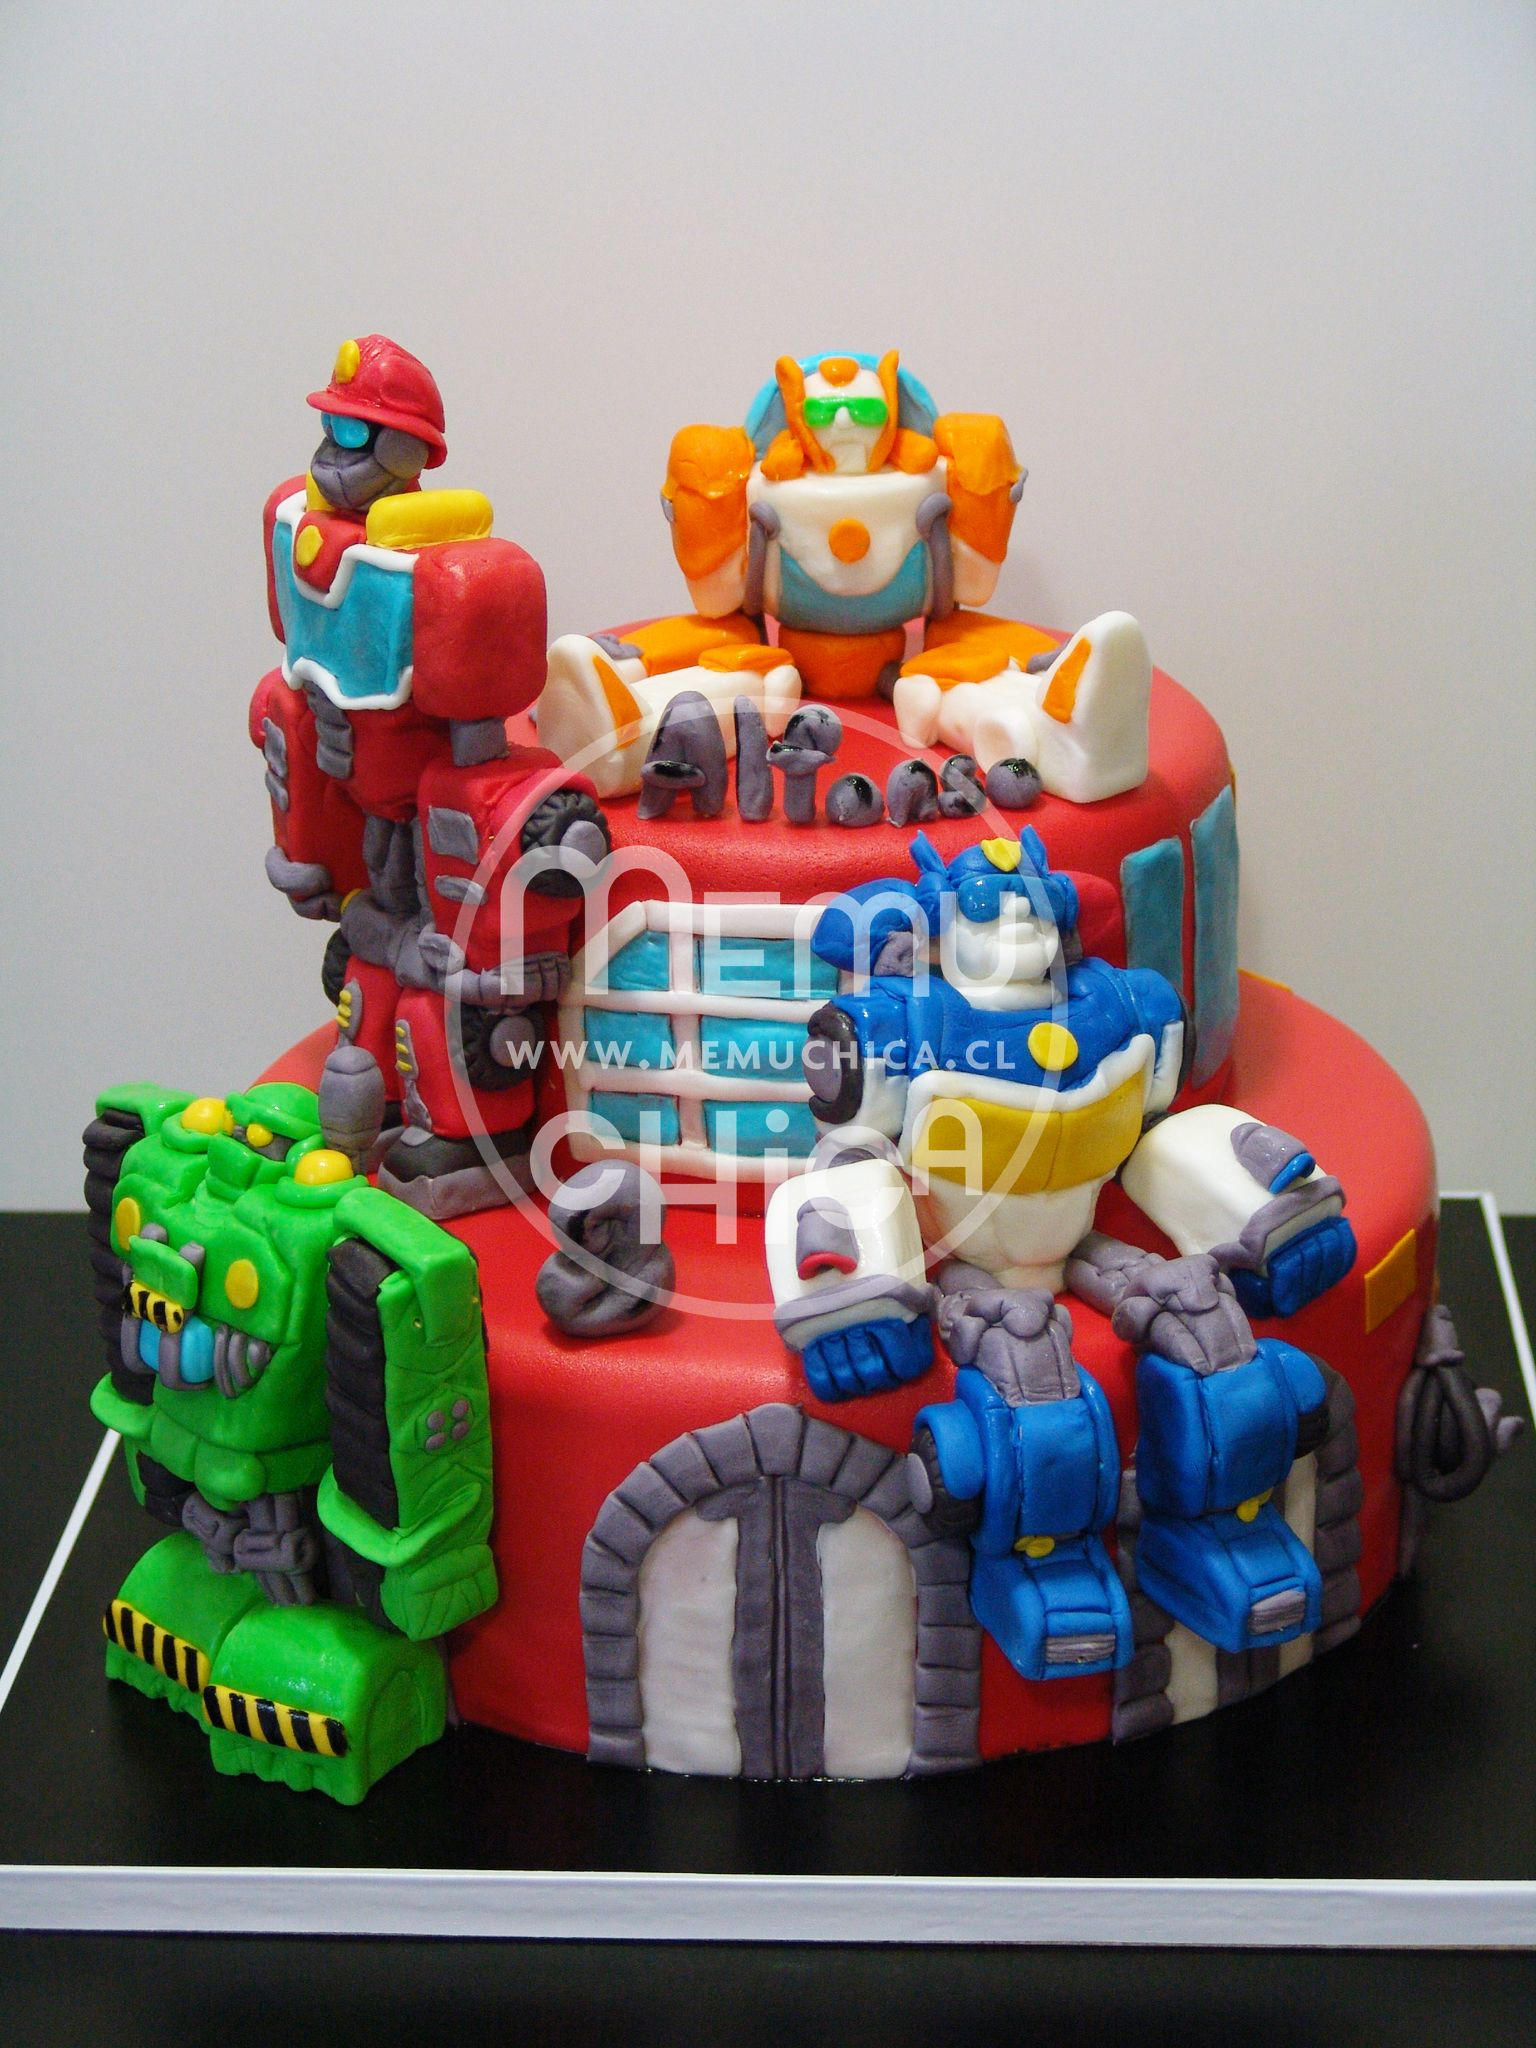 Rescue Bots Nics Birthday In 2018 Pinterest Rescue Bots Cake